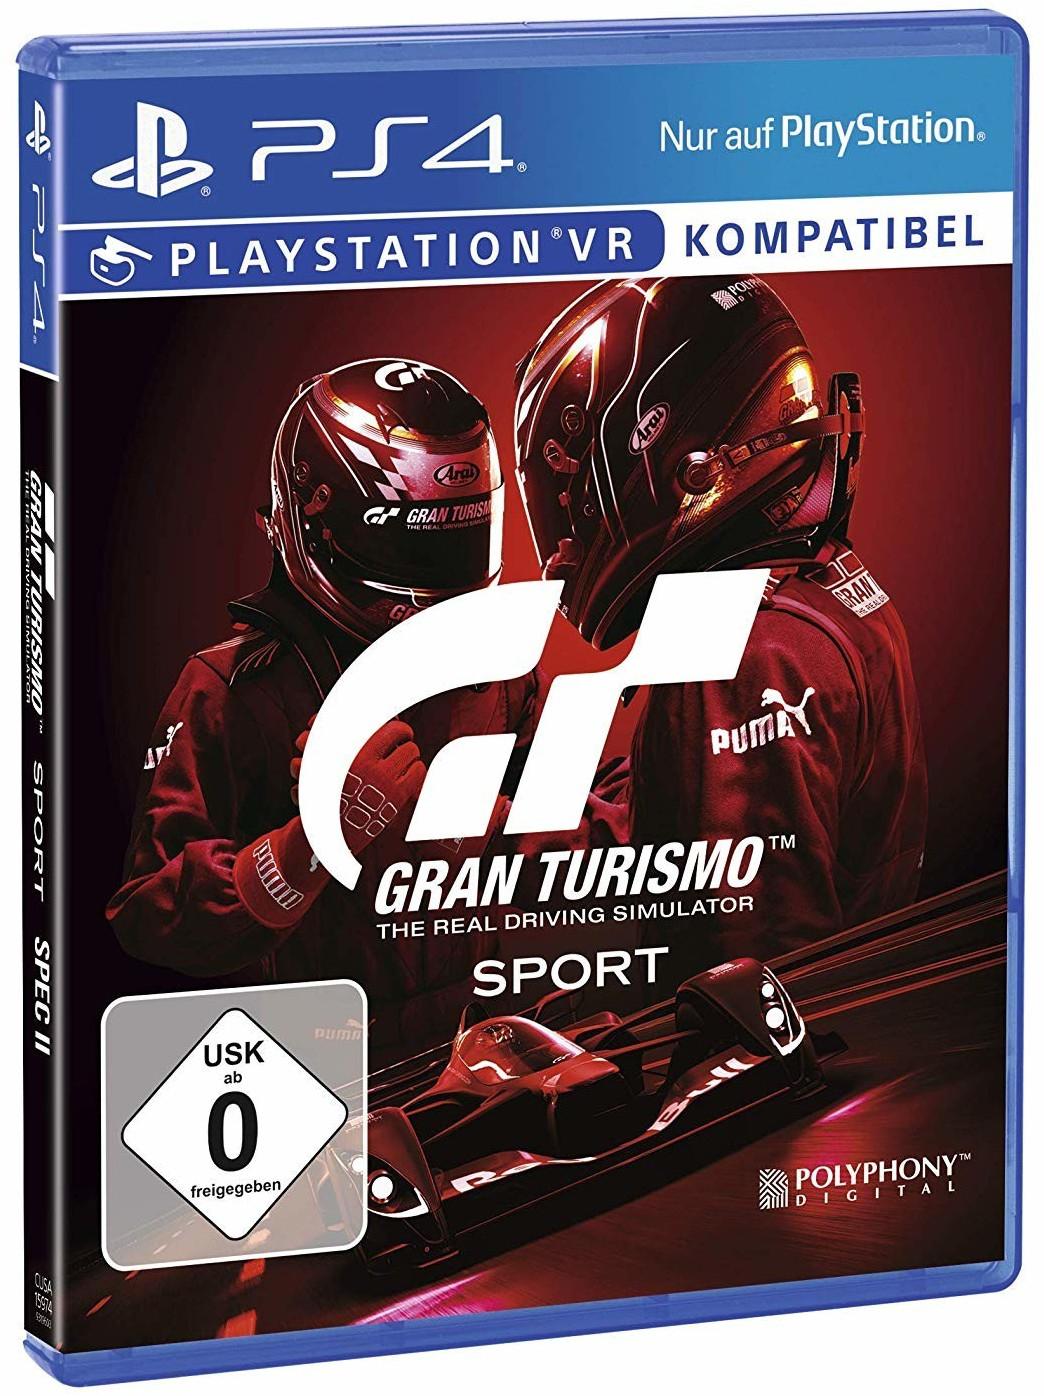 [Prime] Gran Turismo™ Sport – Spec(ial) Edition II (inkl. 2.5M Credits, Top 10-Fahrzeuge) - 19,99€ | Standard Edition für 14,99€